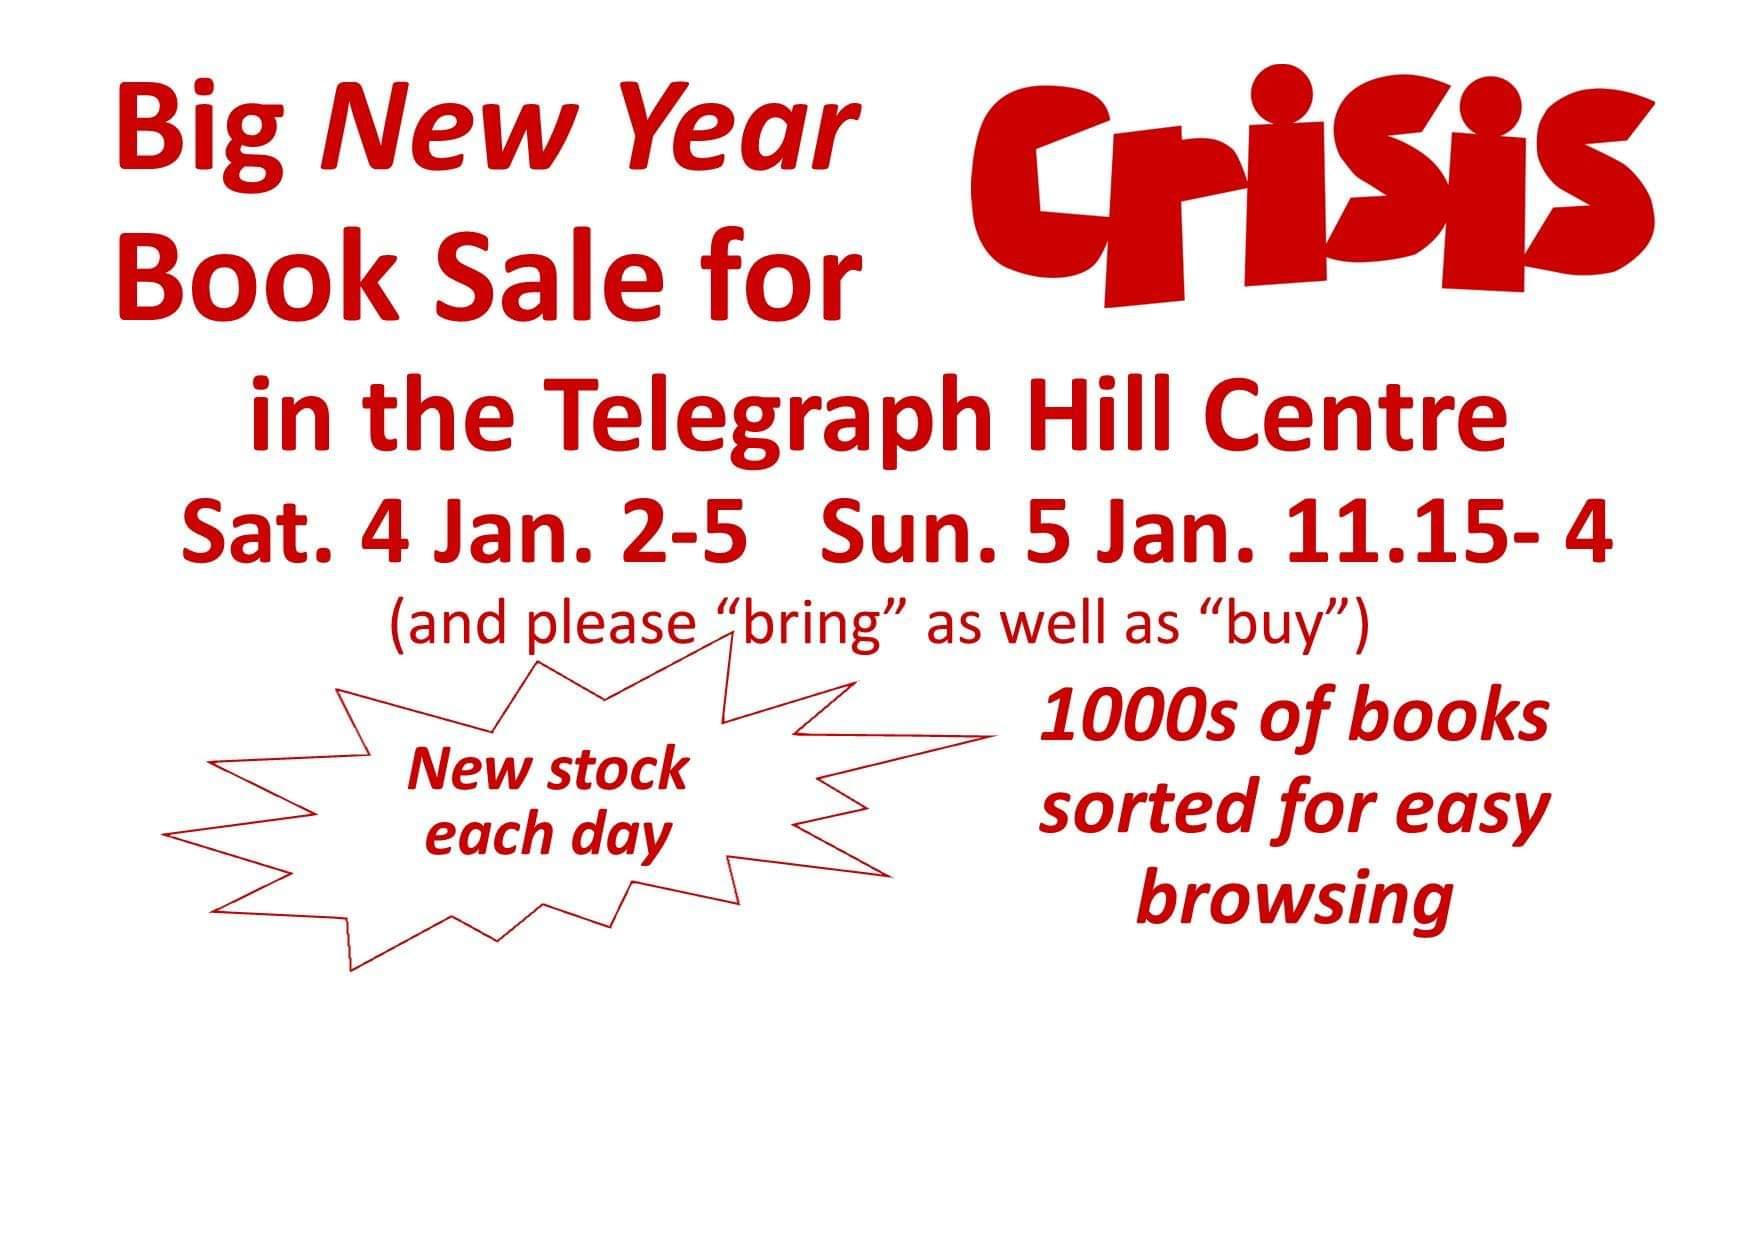 Crisis fundraising booksale